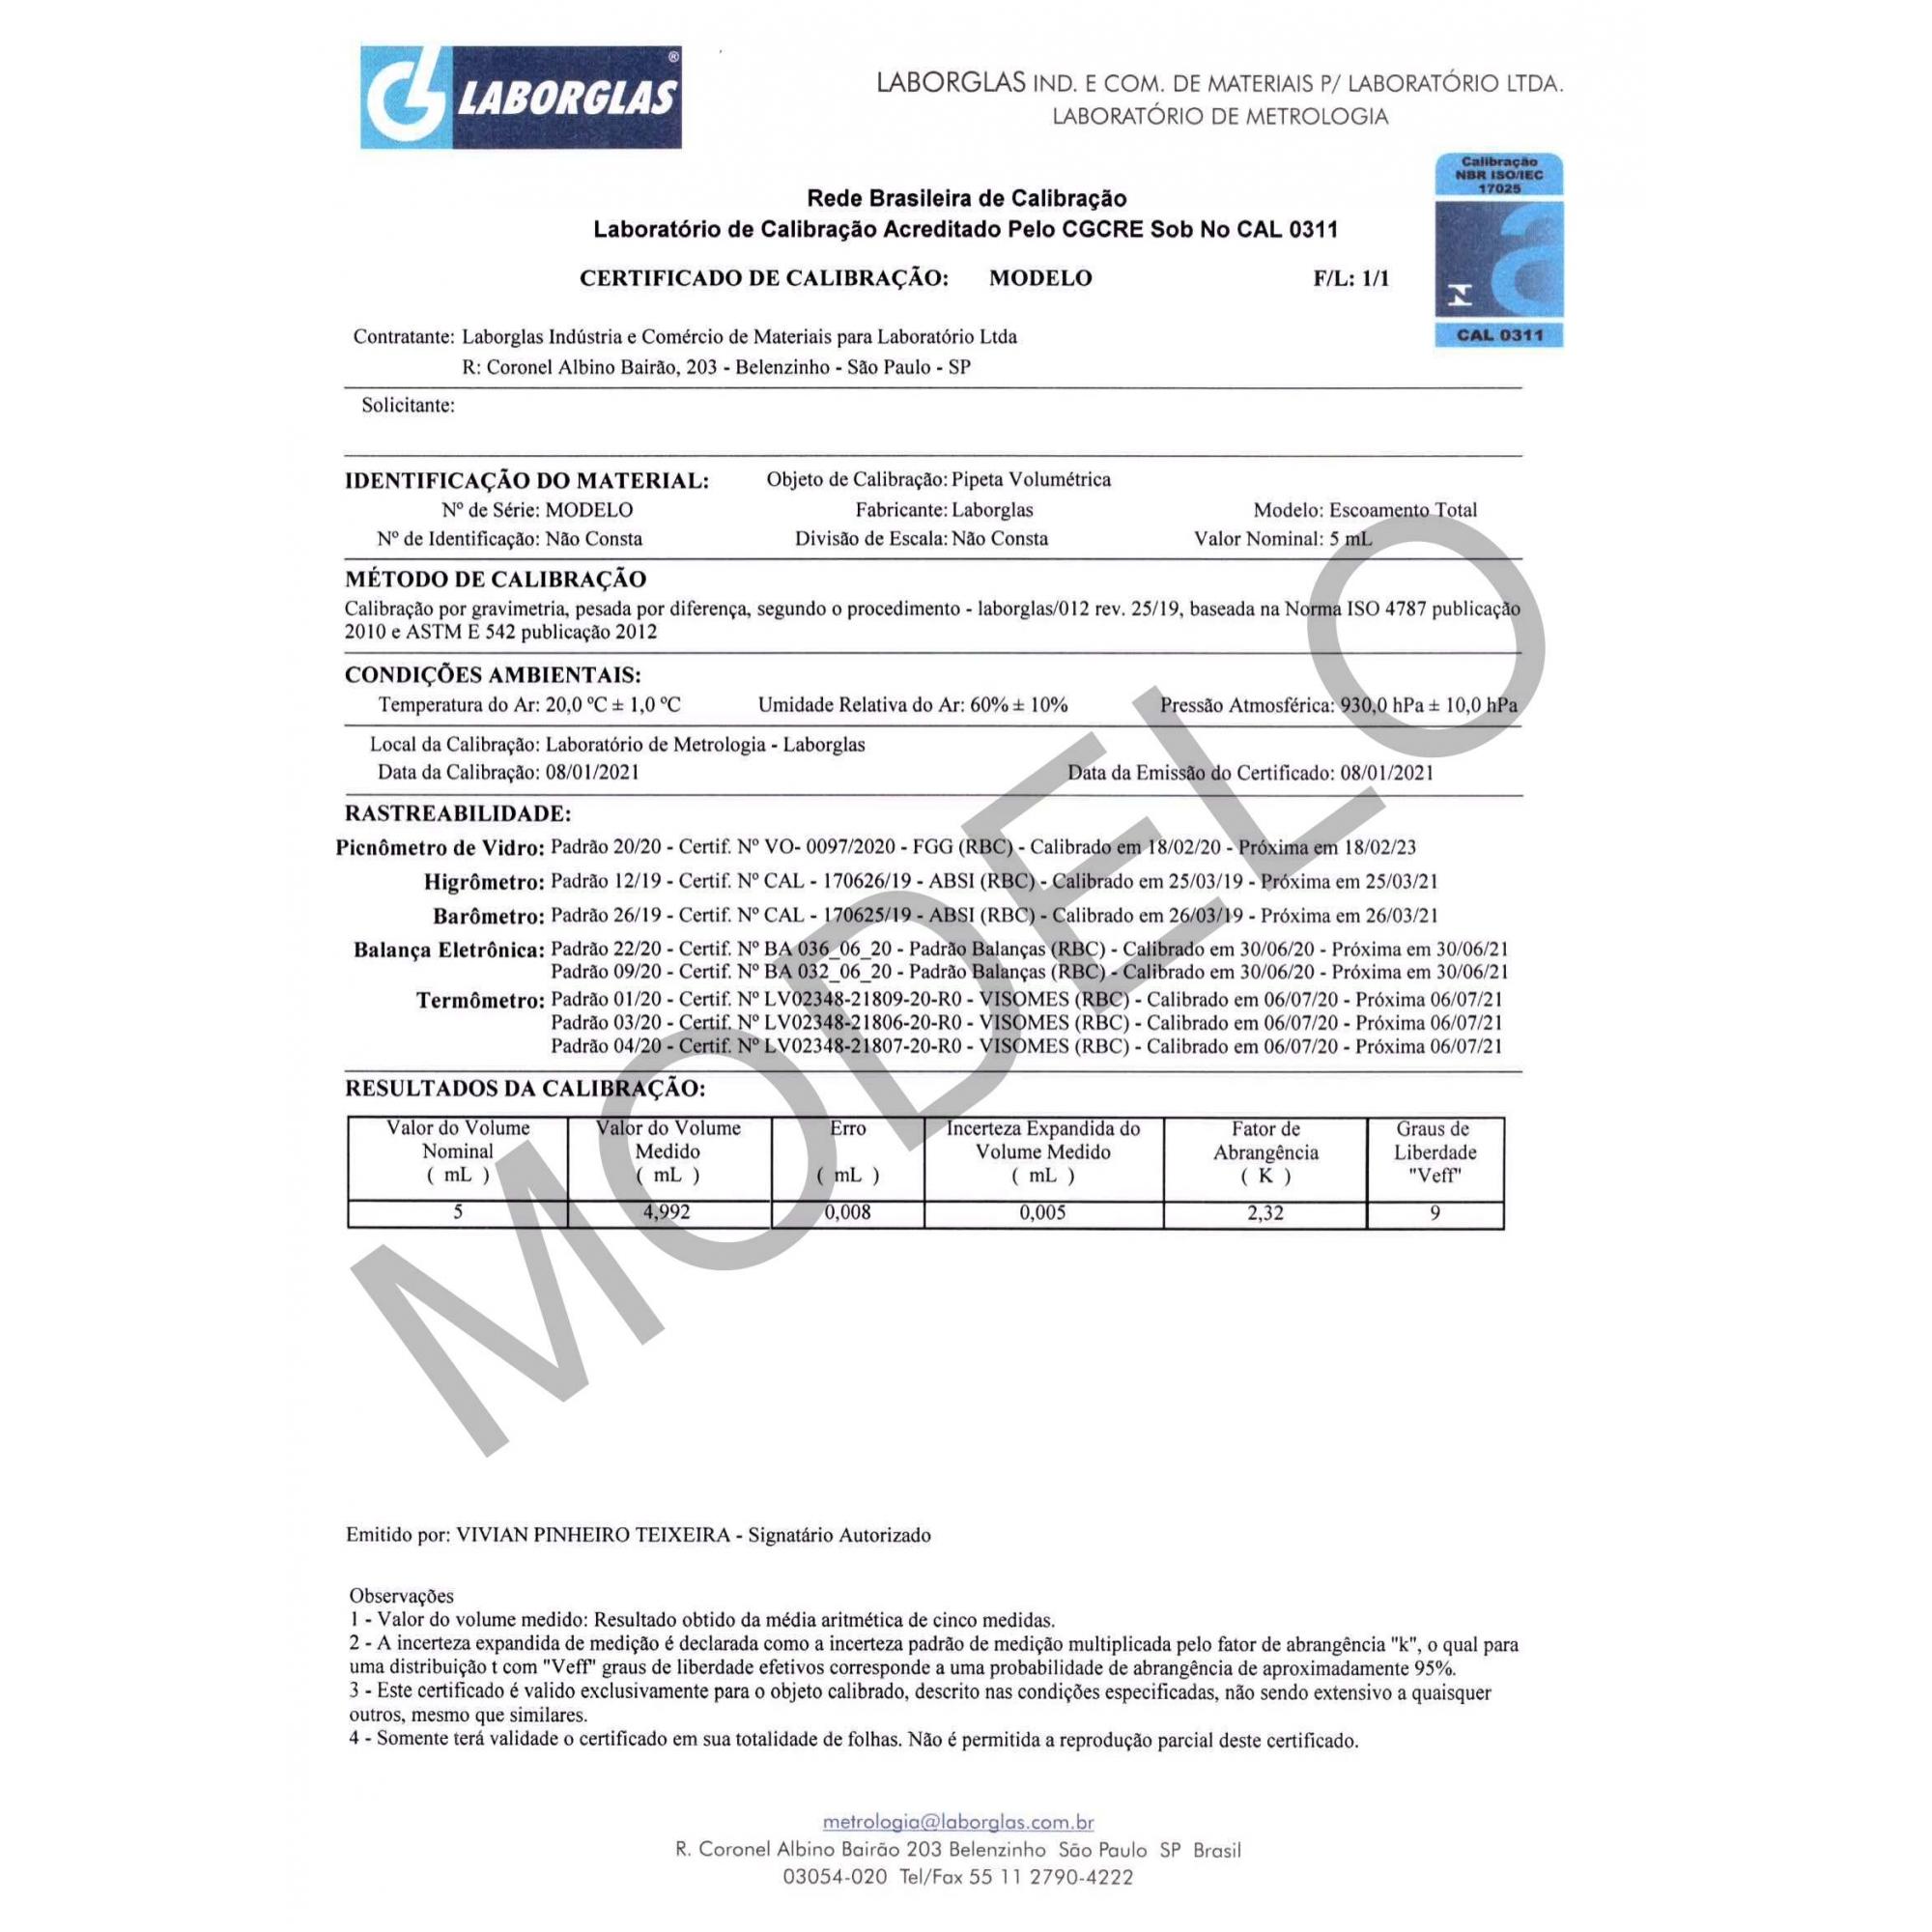 PIPETA VOLUMÉTRICA ESGOTAMENTO TOTAL 5 ML CERTIFICADO RBC - Laborglas - Cód. 9433706-R